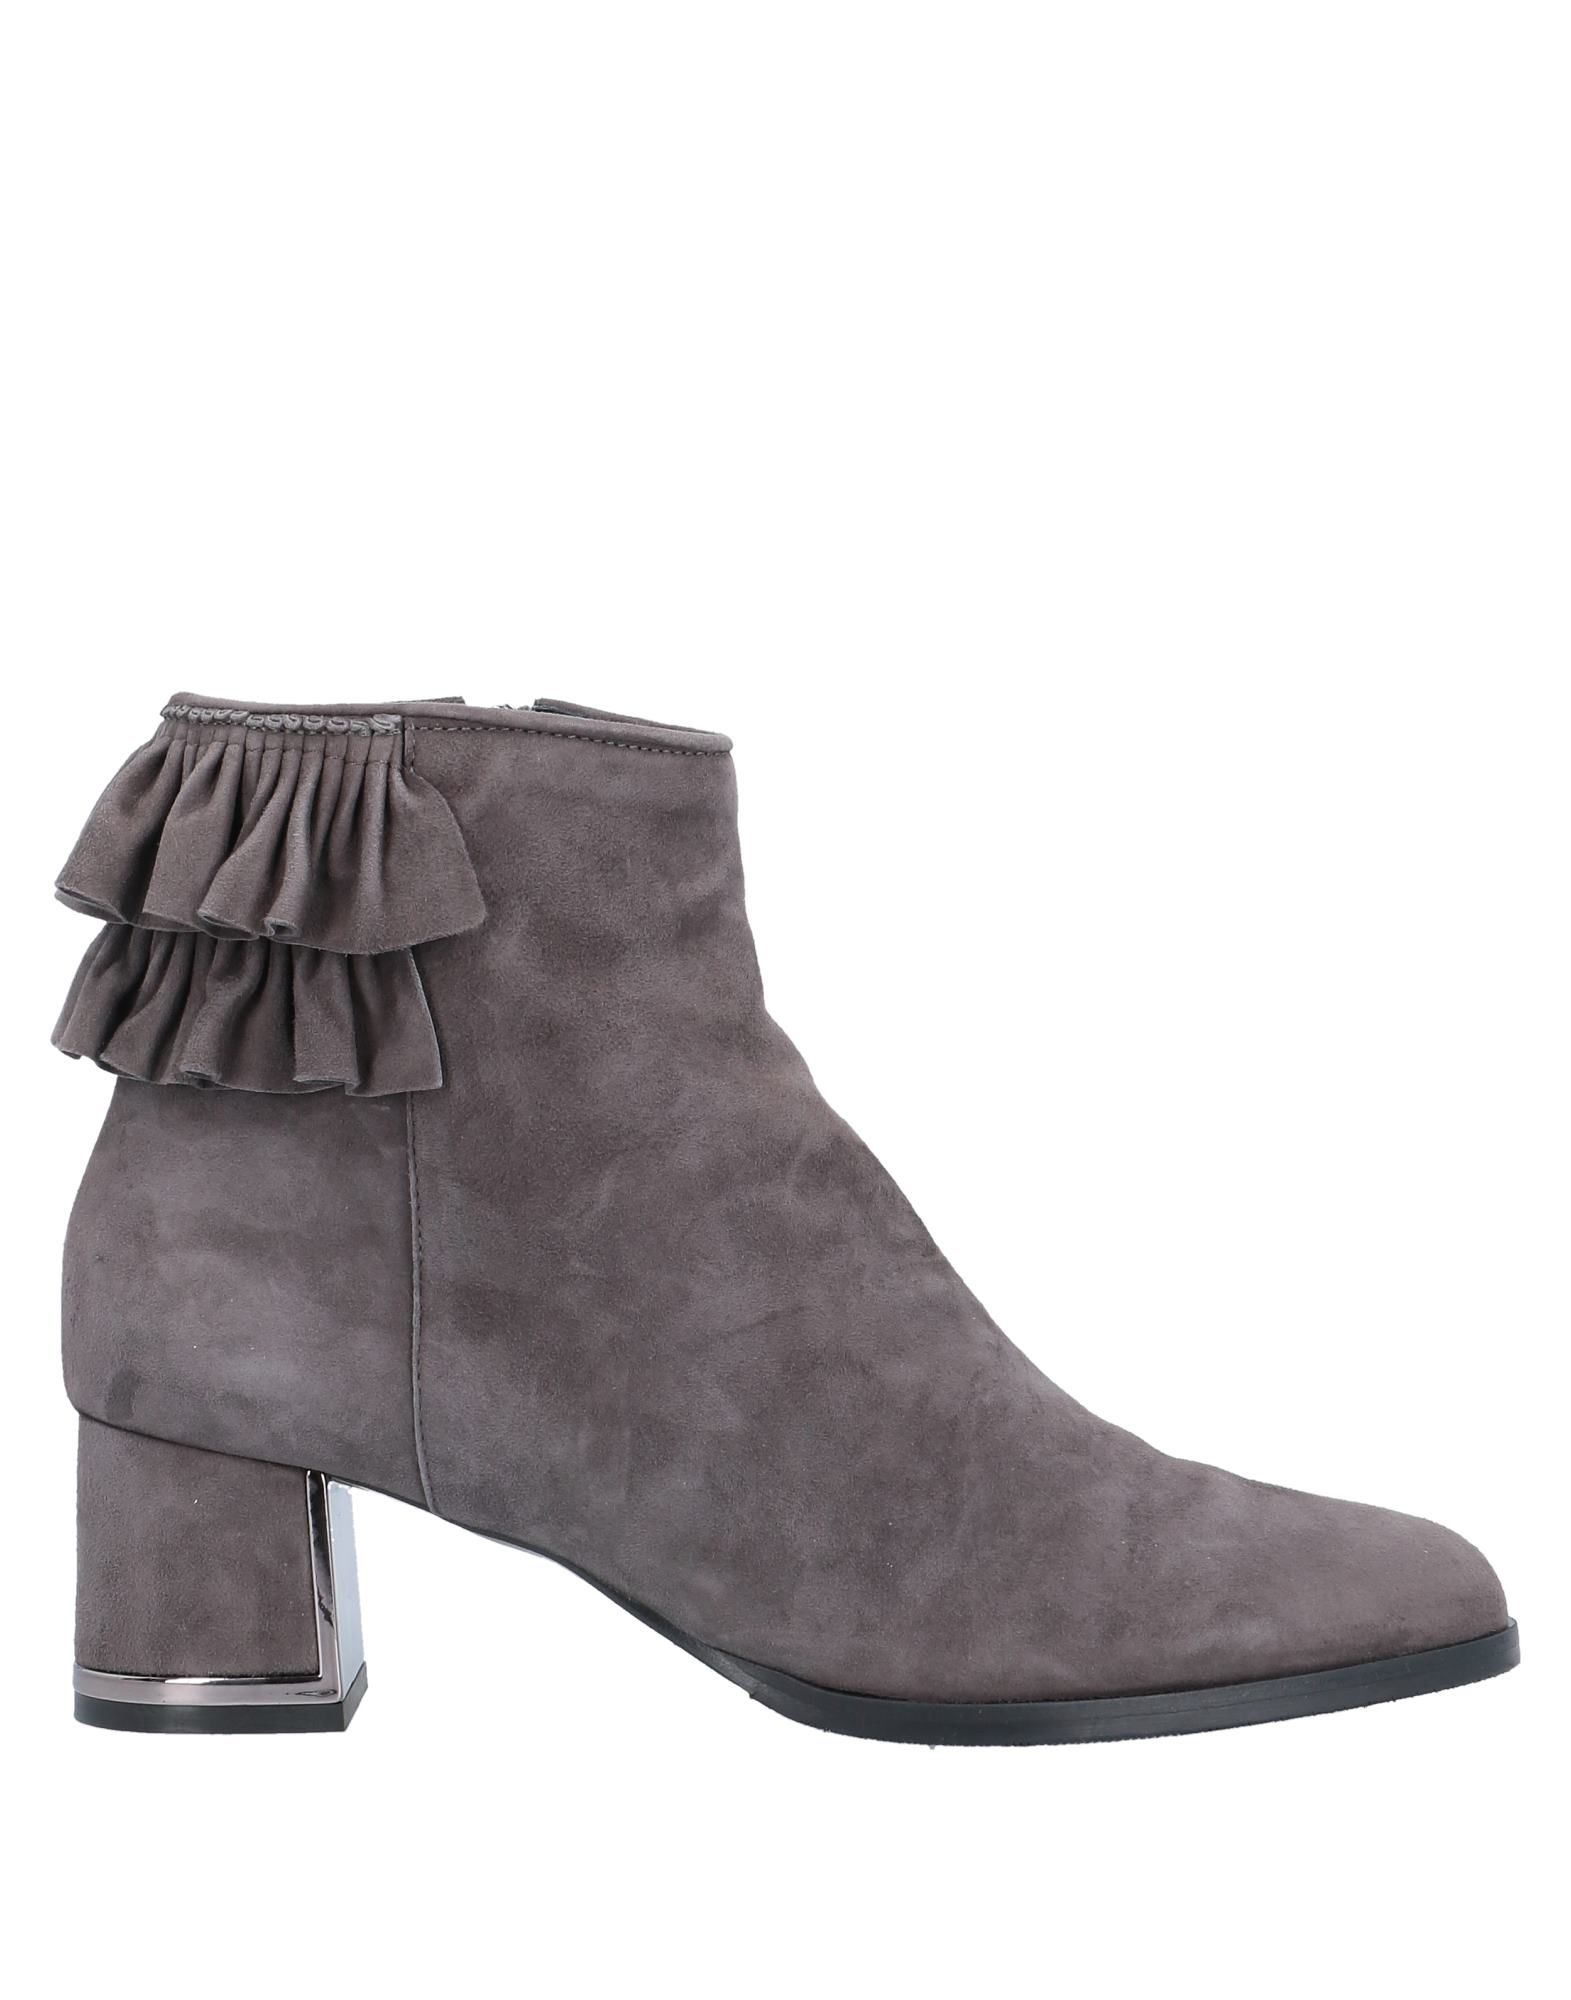 VERDECCHIA & MANIQUA' Полусапоги и высокие ботинки